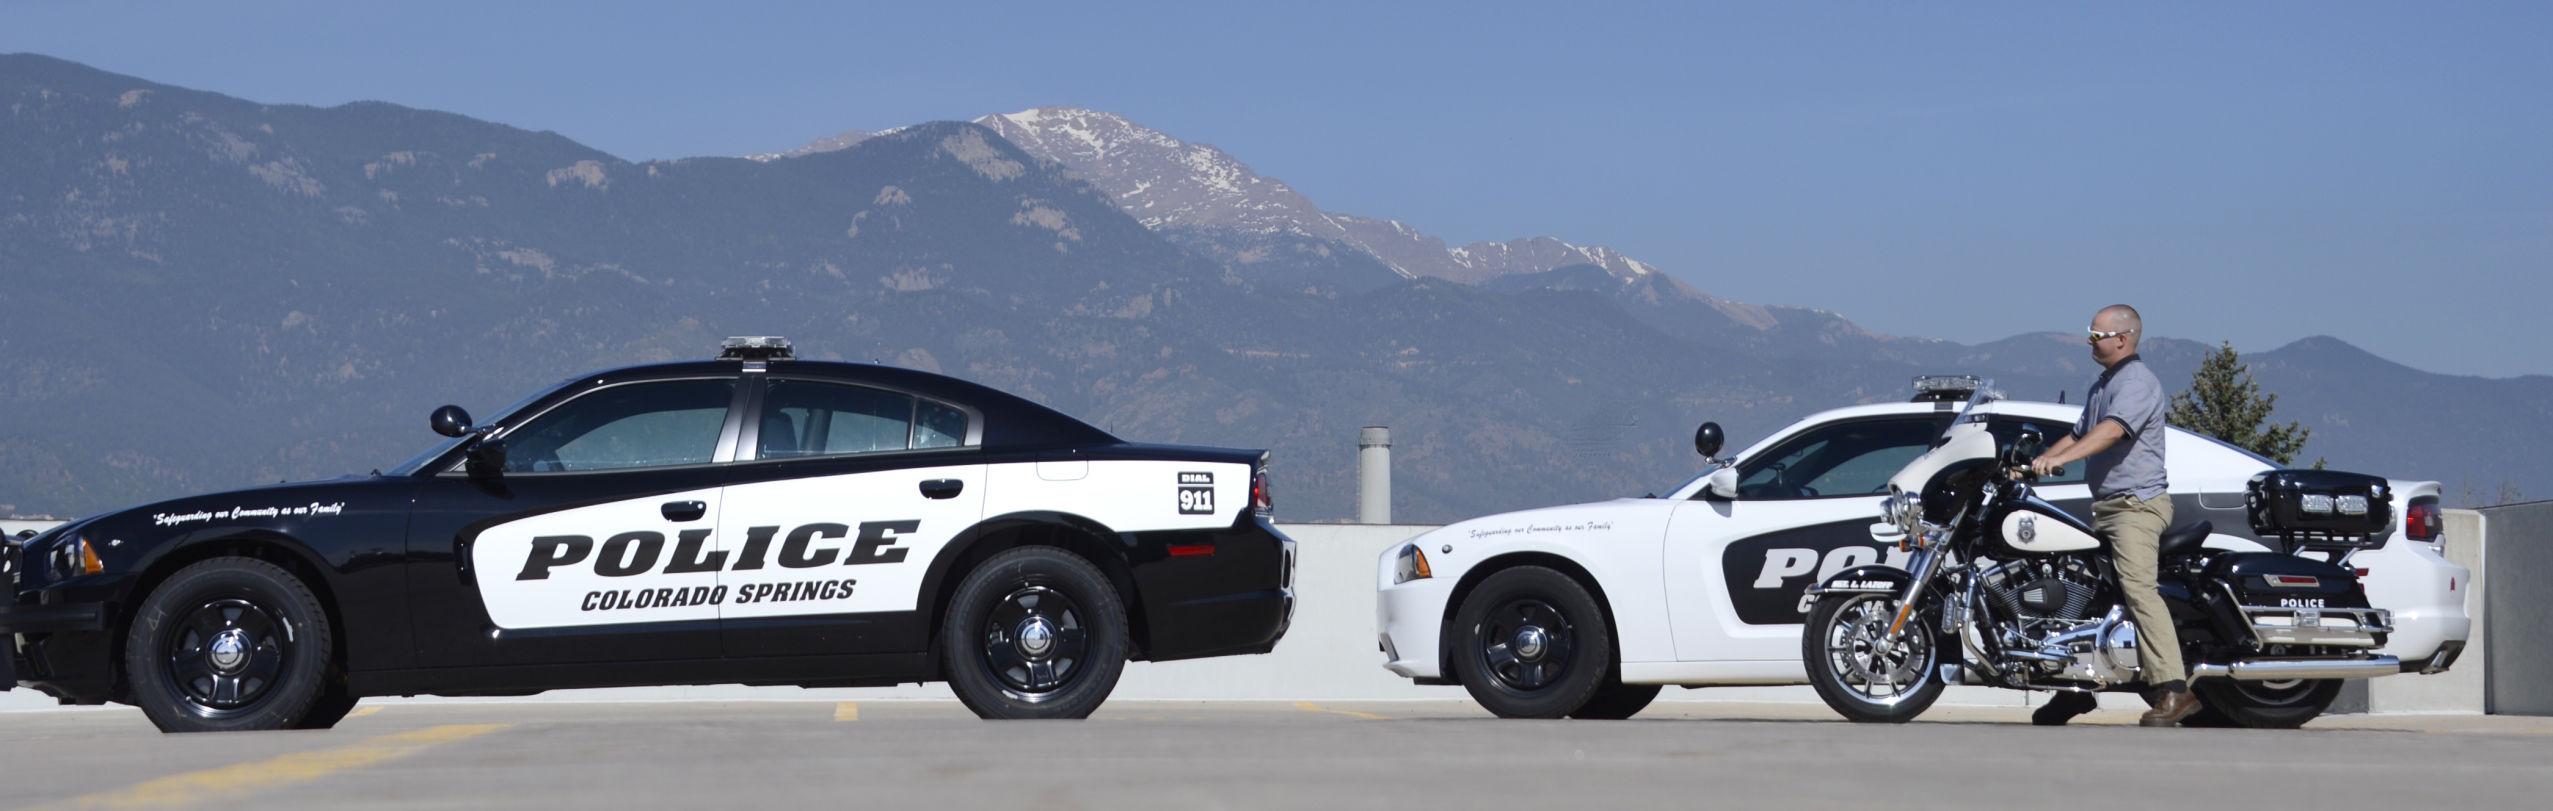 POLICE CARS COLOR SCHEME